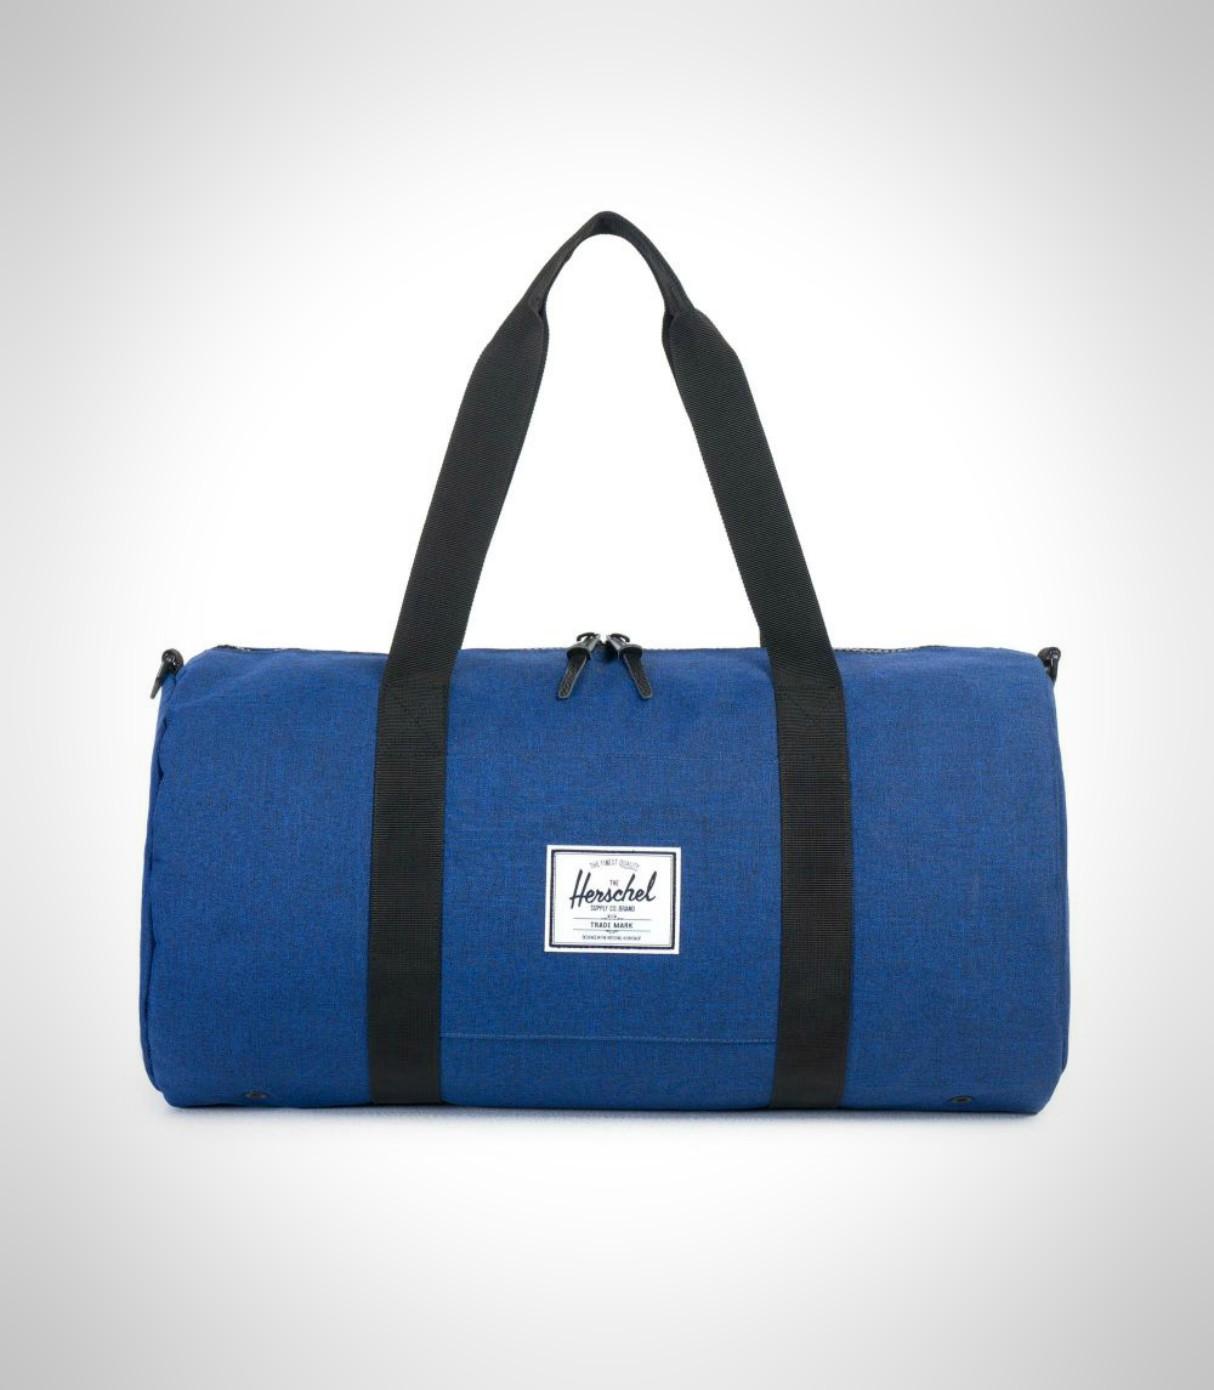 gym-clothes-for-men-workout-gear-bag-herschel